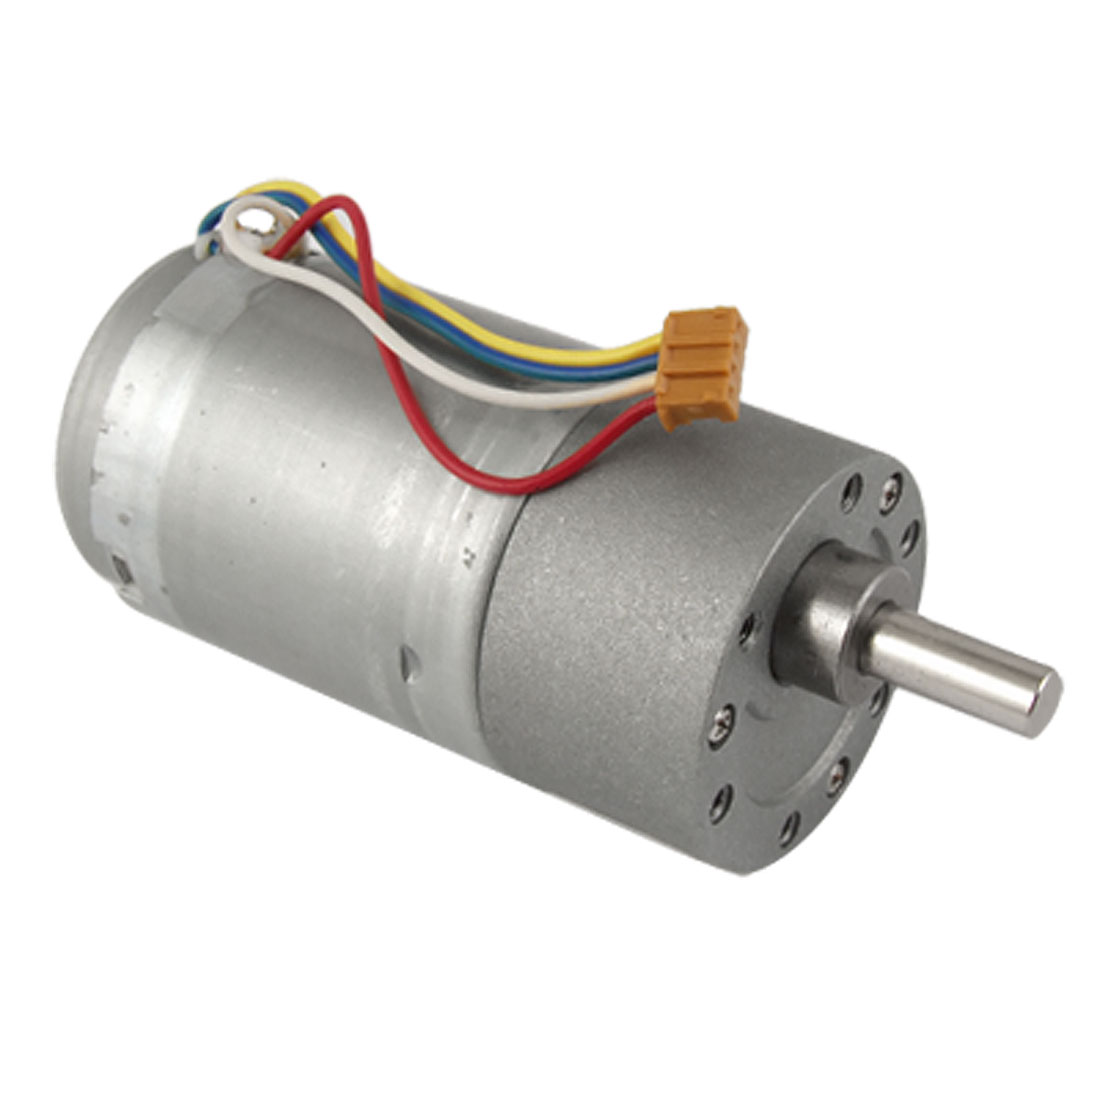 200RPM 12V 0.13A High Torque Electric DC Geared Motor 37mm